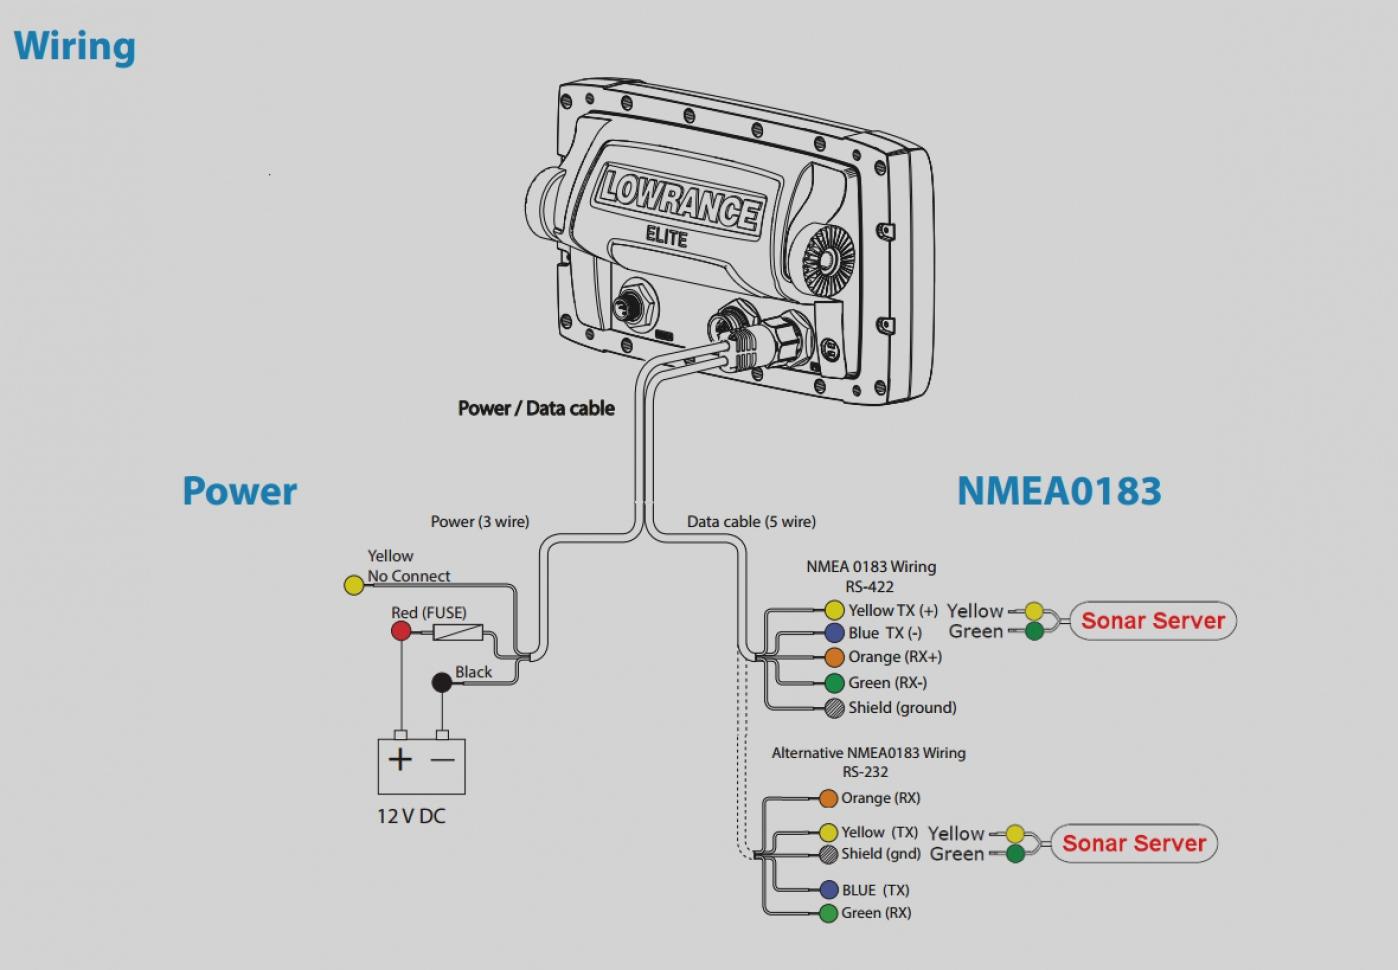 hight resolution of thermostat wiring diagram in addition garmin nmea 0183 wiring rh 4 9 humans of hamburg de